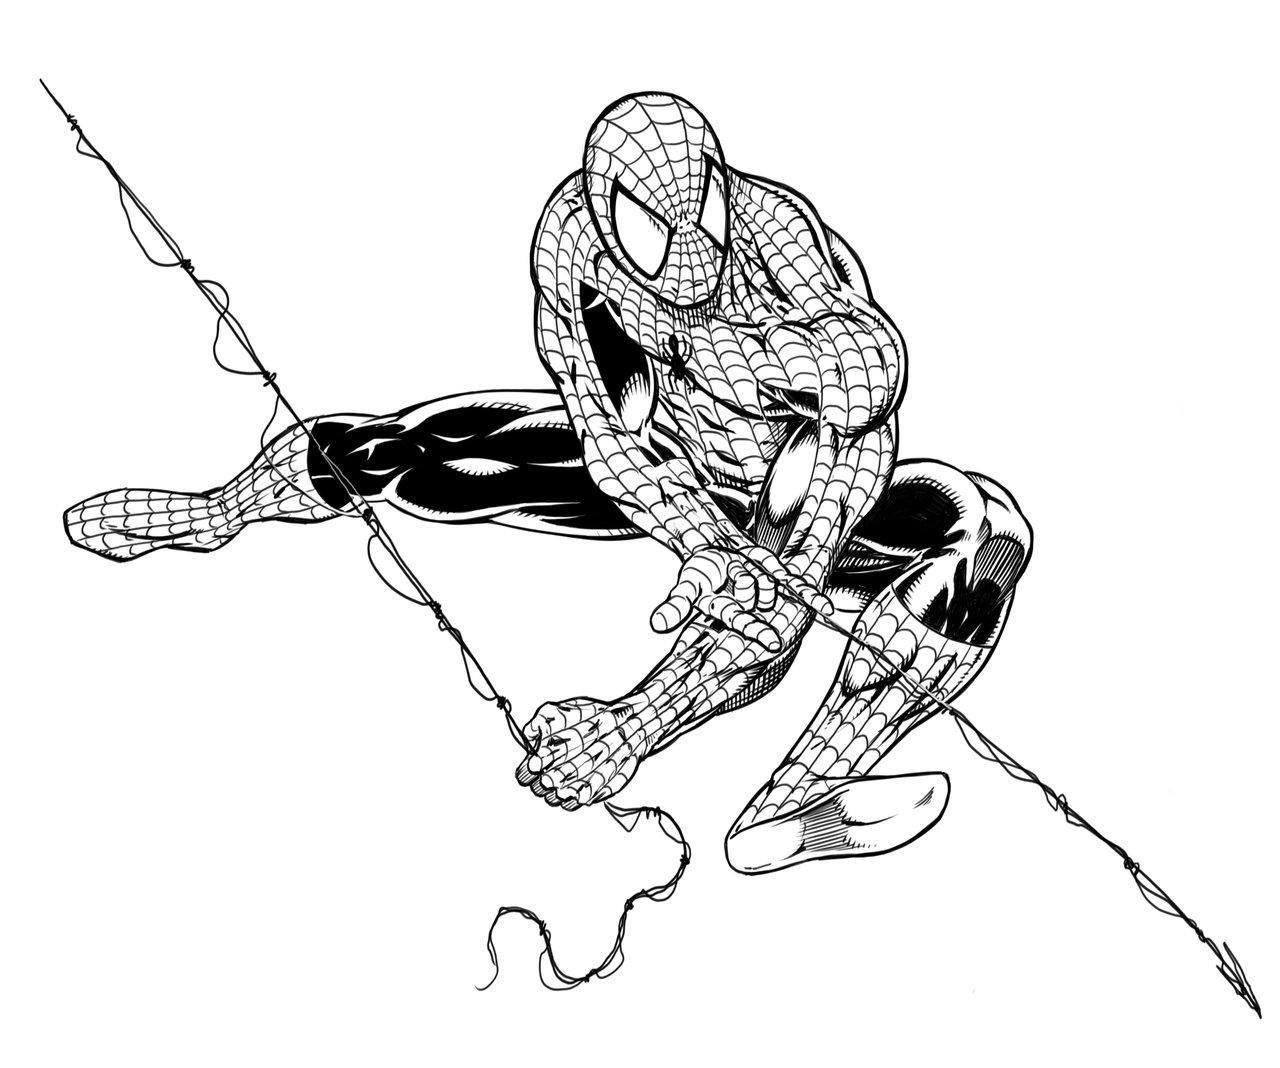 Drawn spiderman Image Beautiful Spiderman Spiderman Drawing